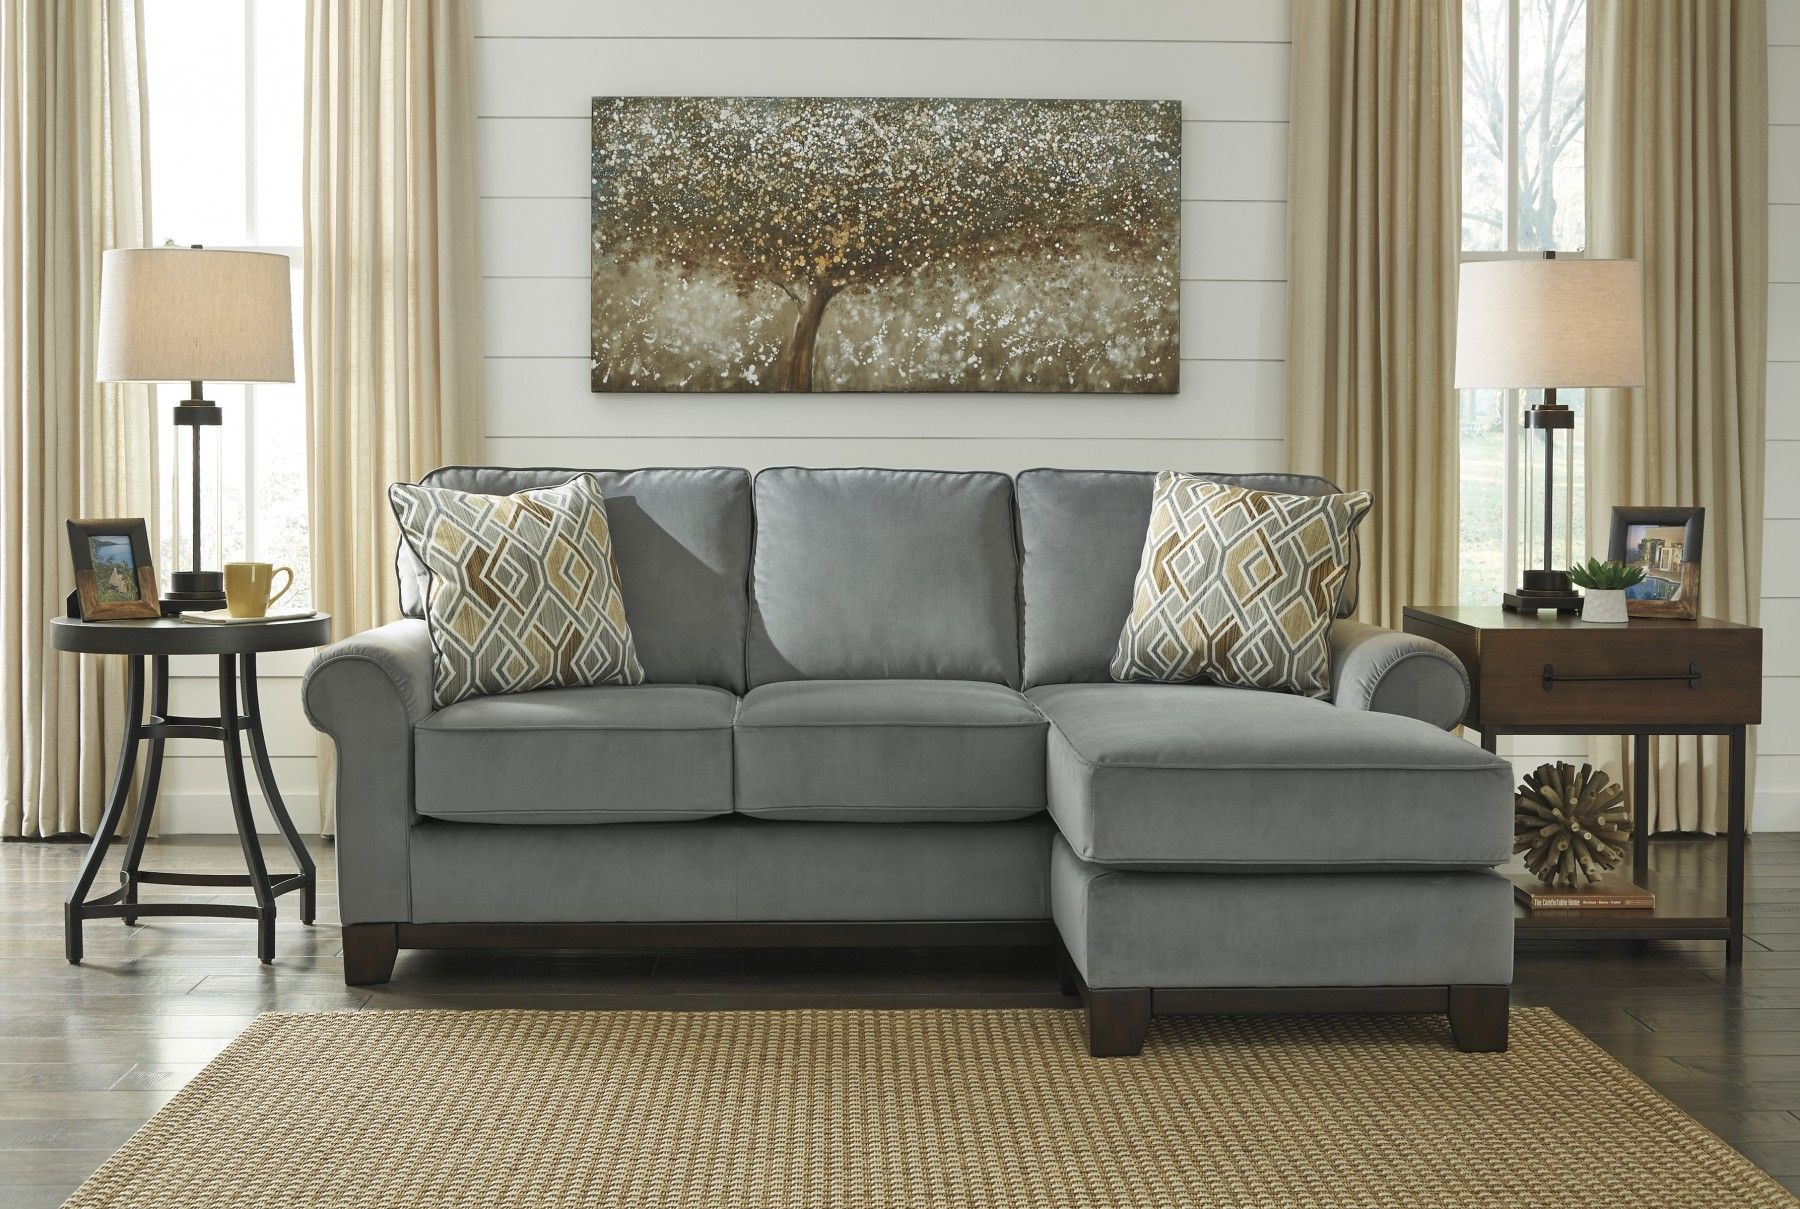 Signature Design 8450118 1 Sectional Sofa Couch Chaise Sofa Sofa